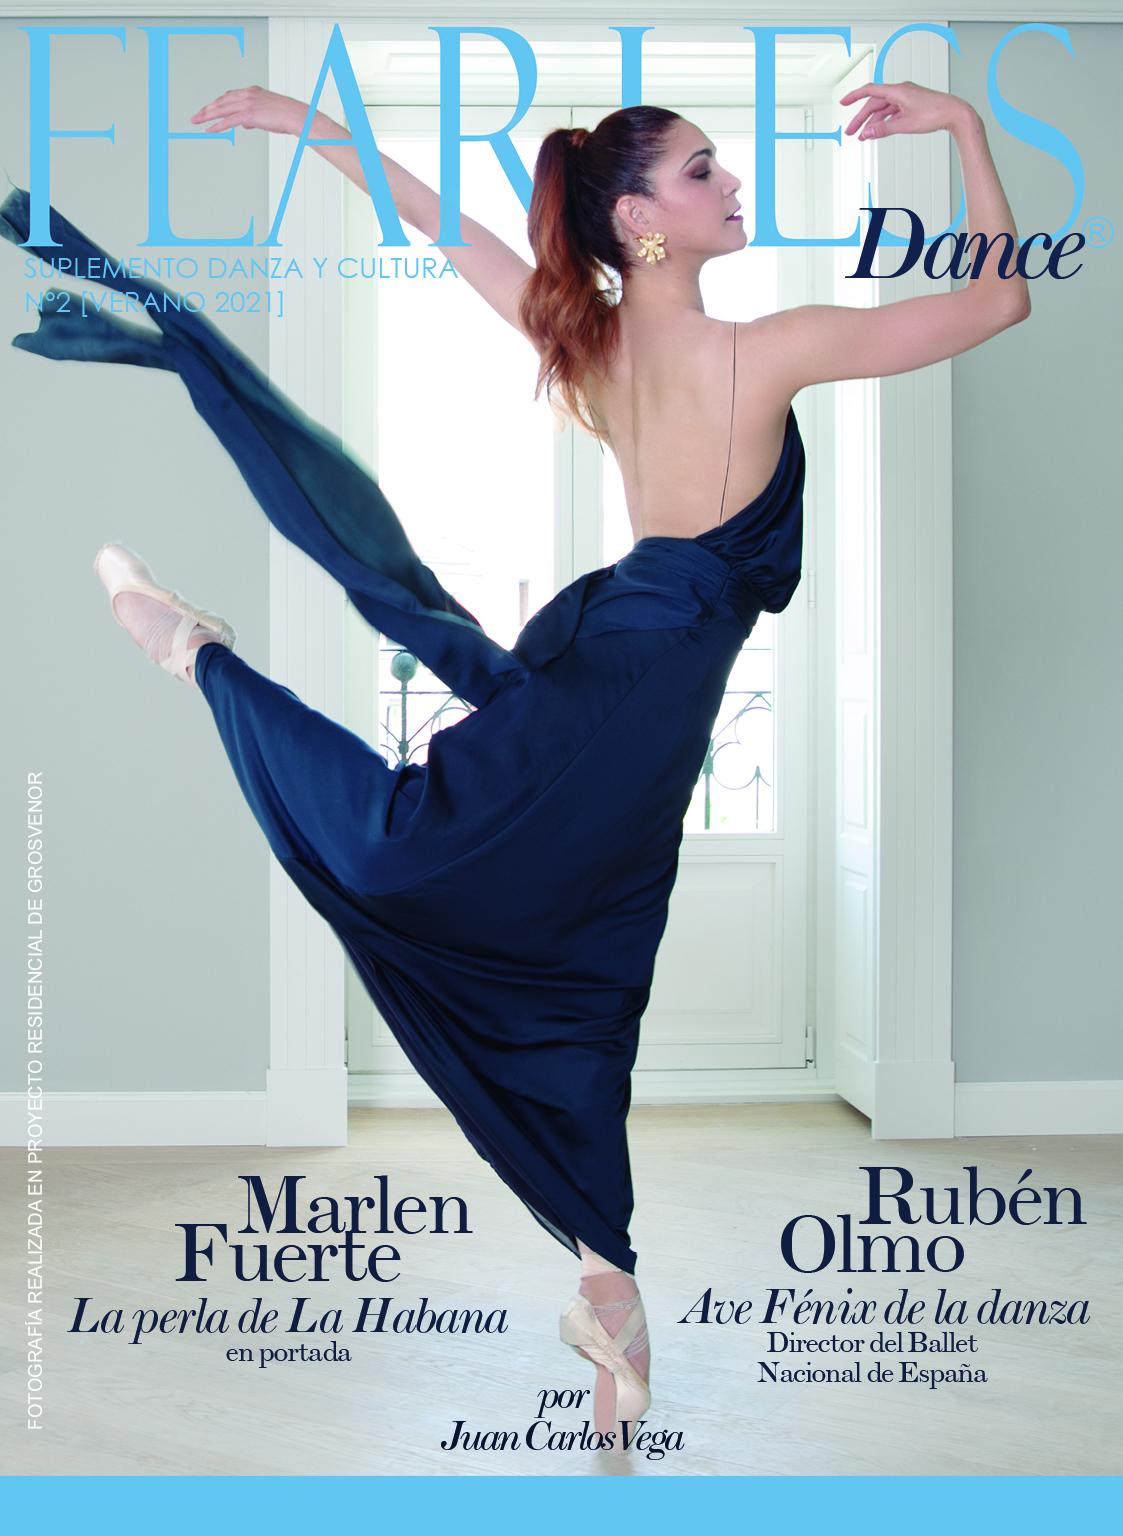 Fearless Dance, editor y fotógrafo